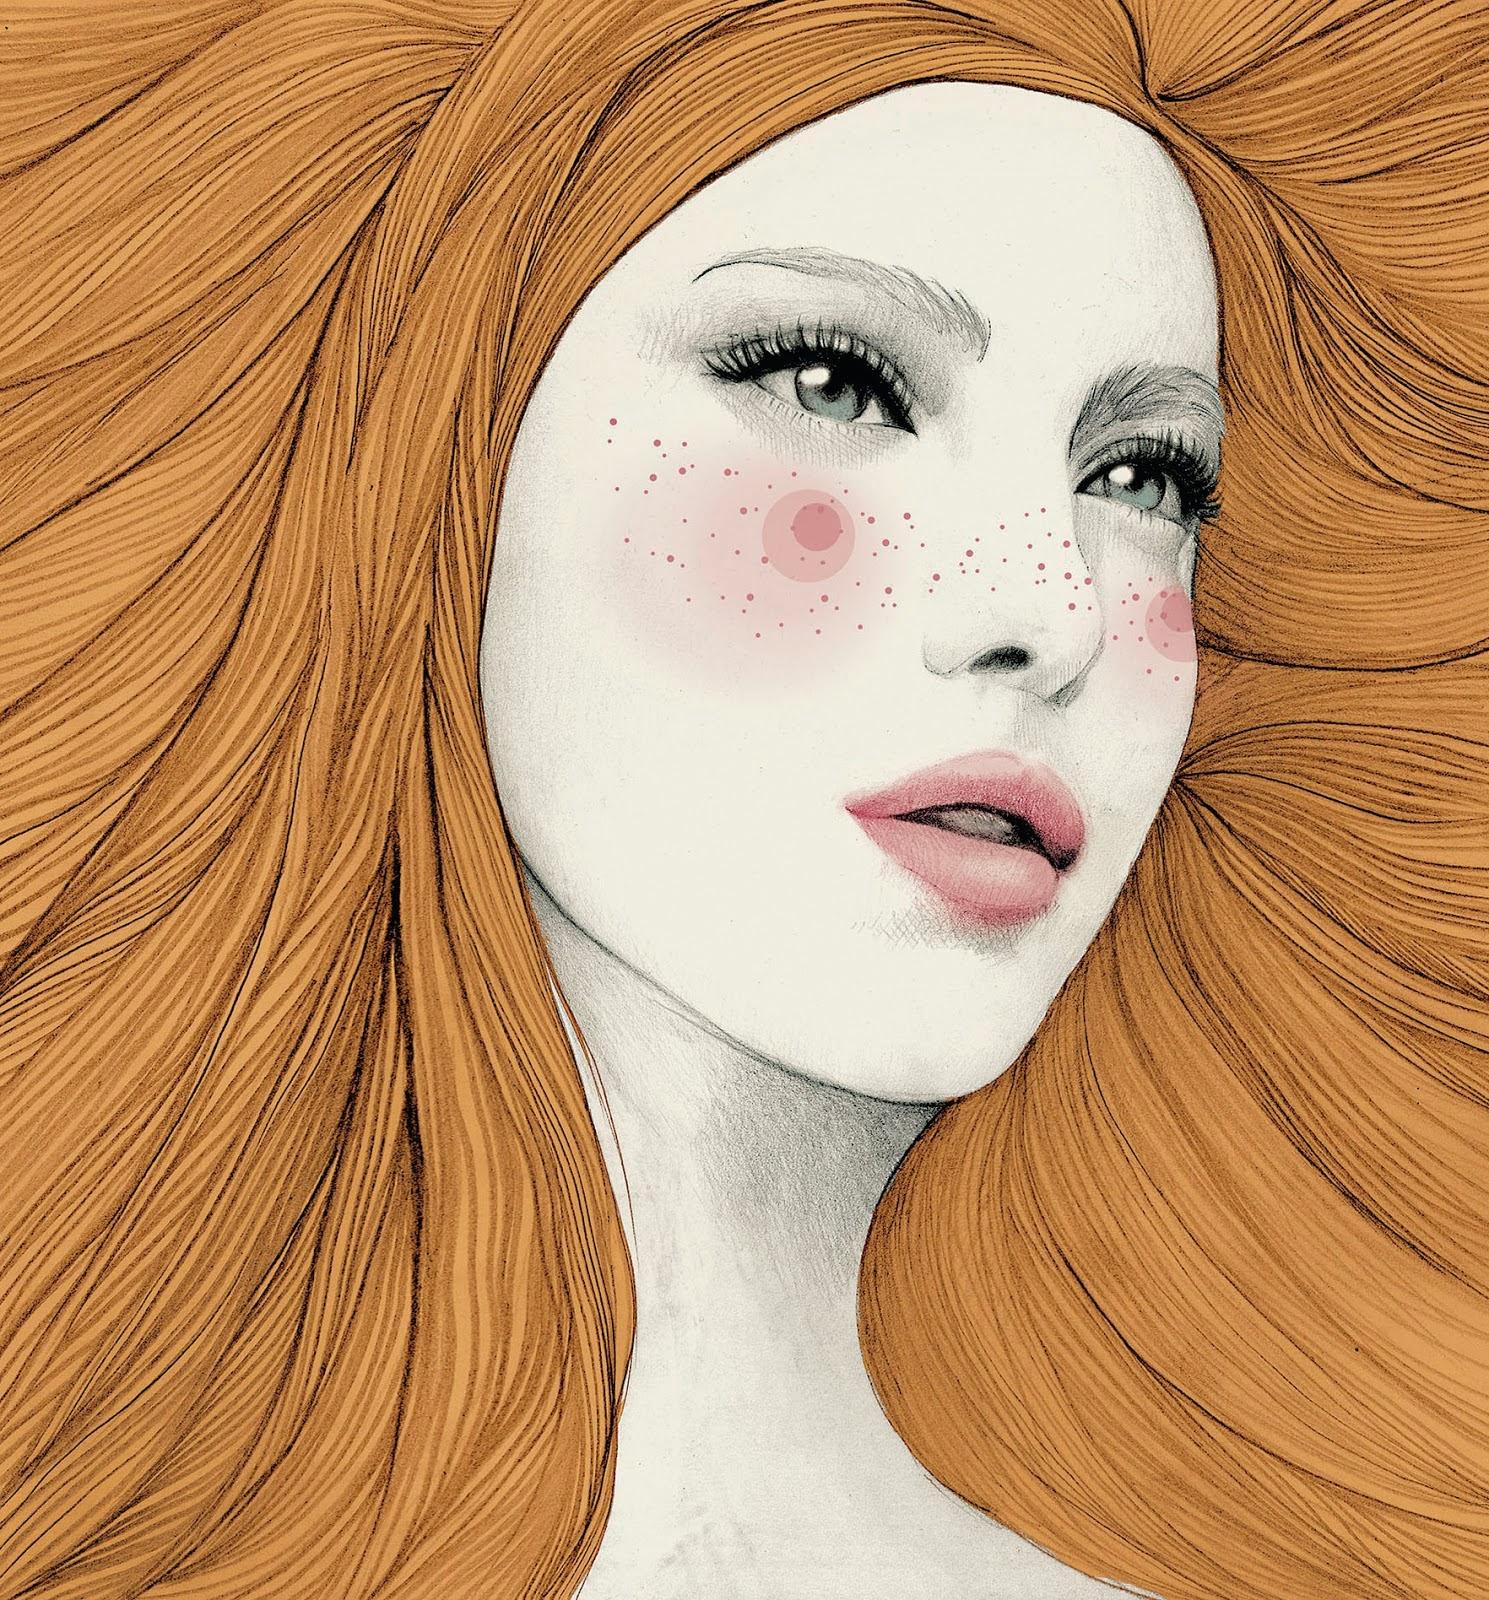 Ilustrarte10: Tipos de retratos